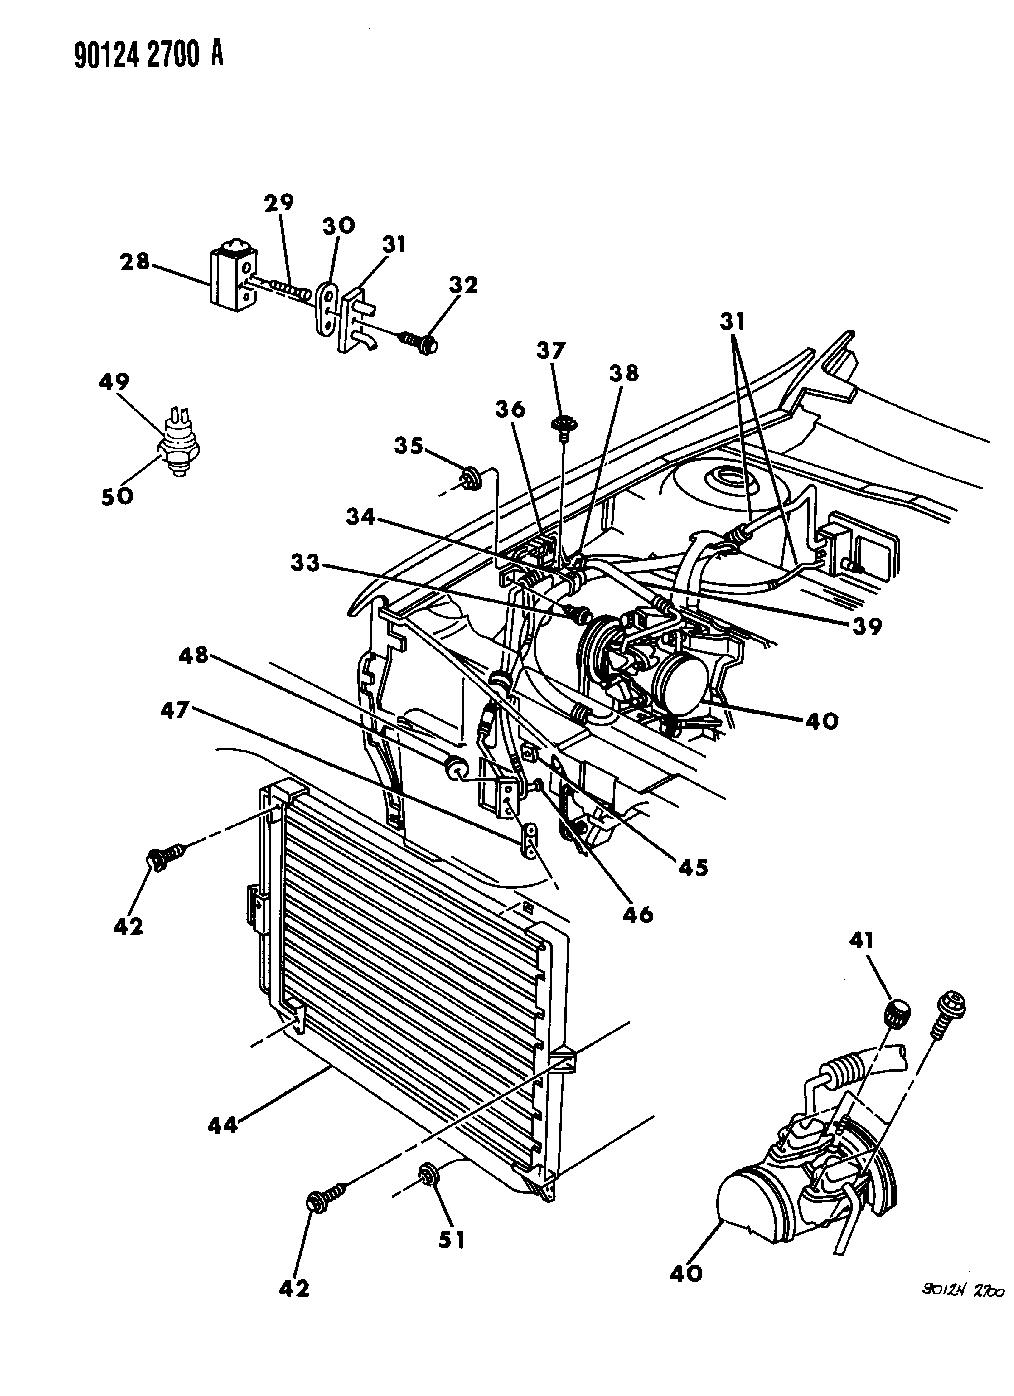 1990 Dodge Spirit Plumbing - A/C & Heater - Thumbnail 2